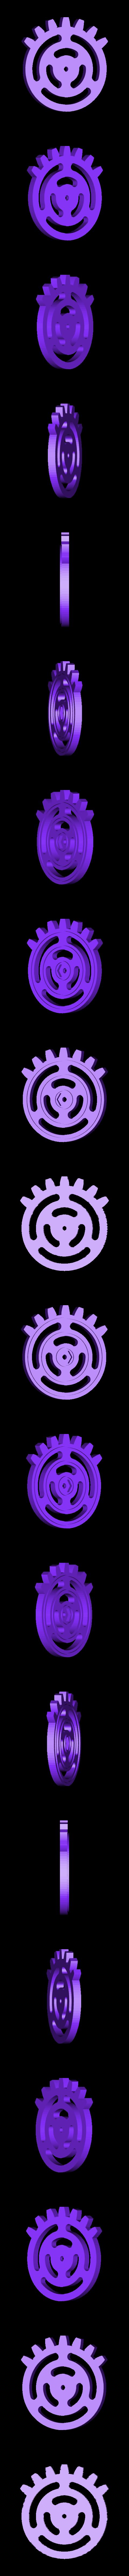 rpb-wheel.stl Download free STL file Reciprocating Rack and Pinion • 3D printable model, Adafruit